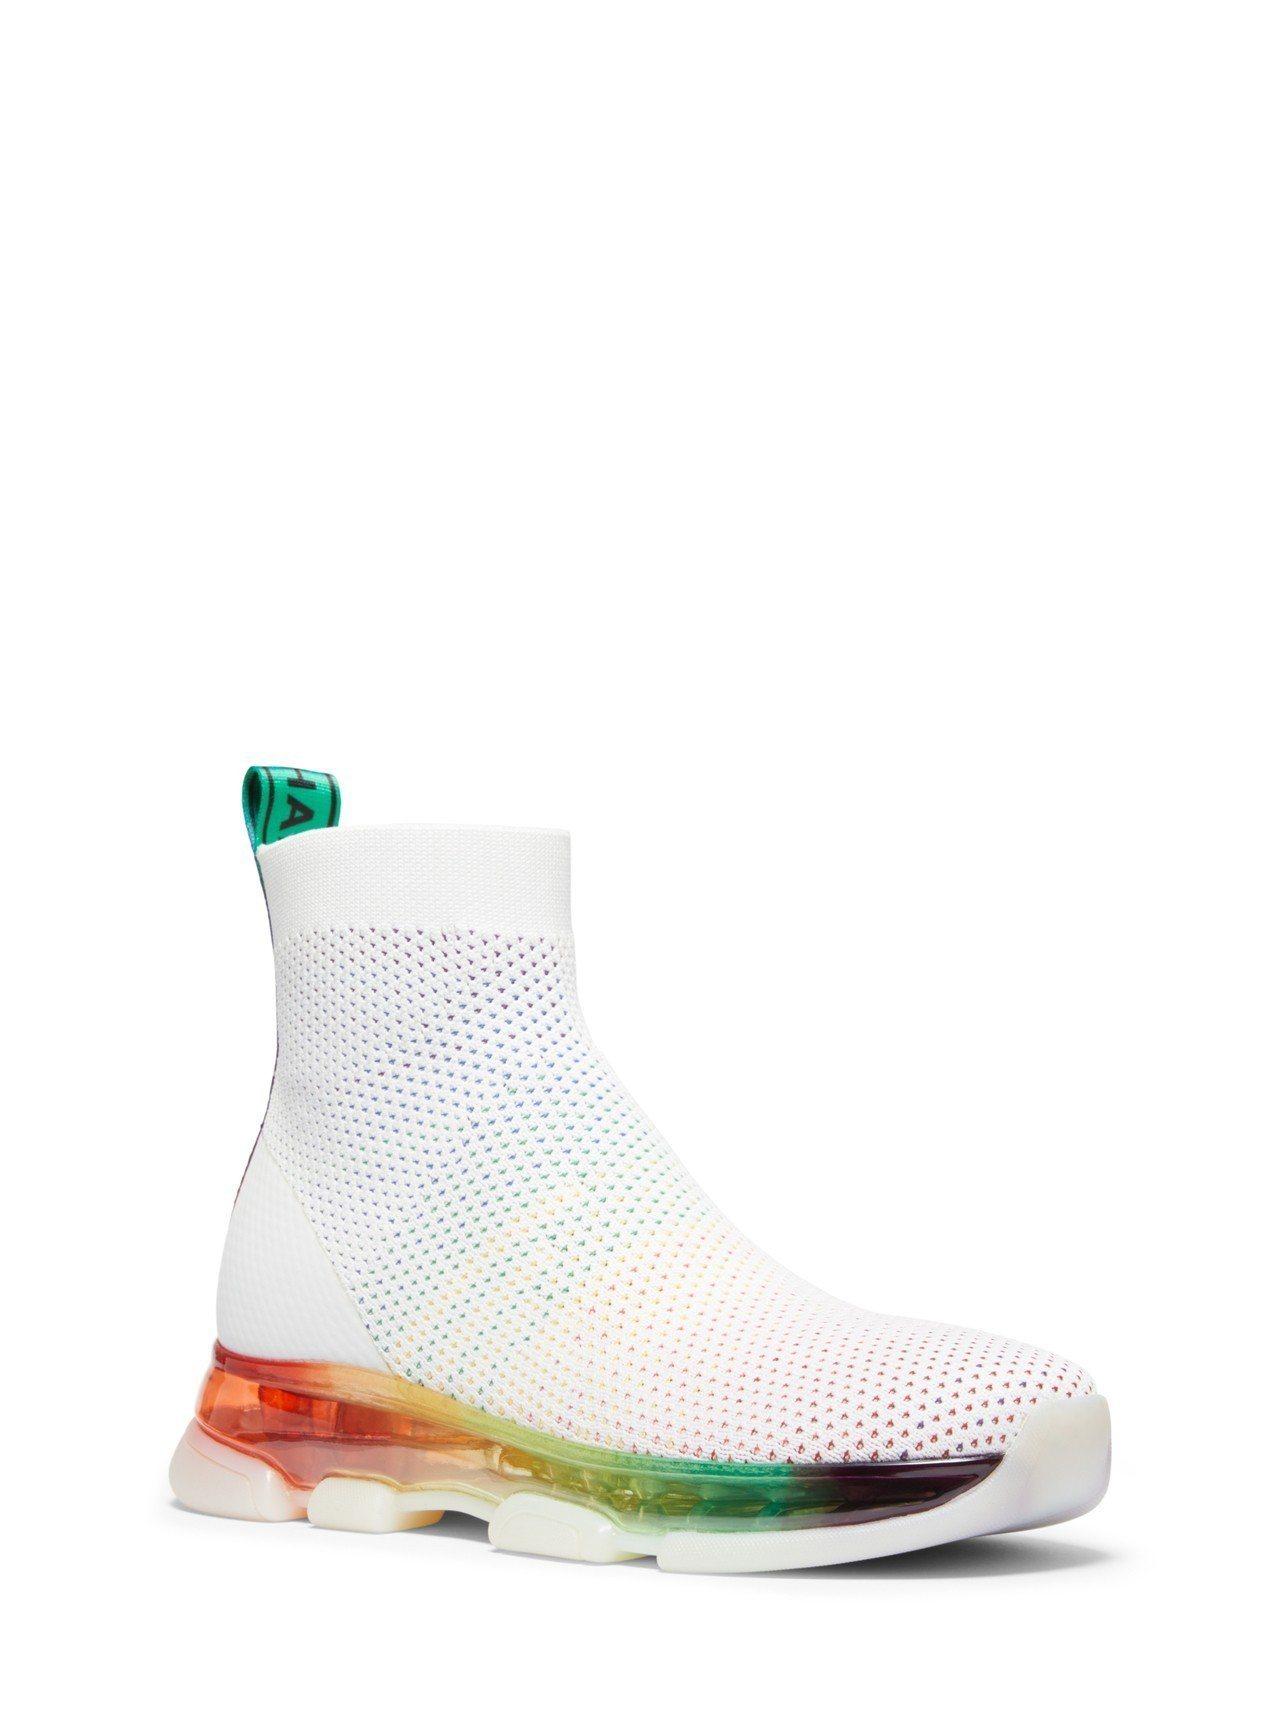 MMK彩紅氣墊襪靴,售價9,000元。圖/MICHAEL KORS提供